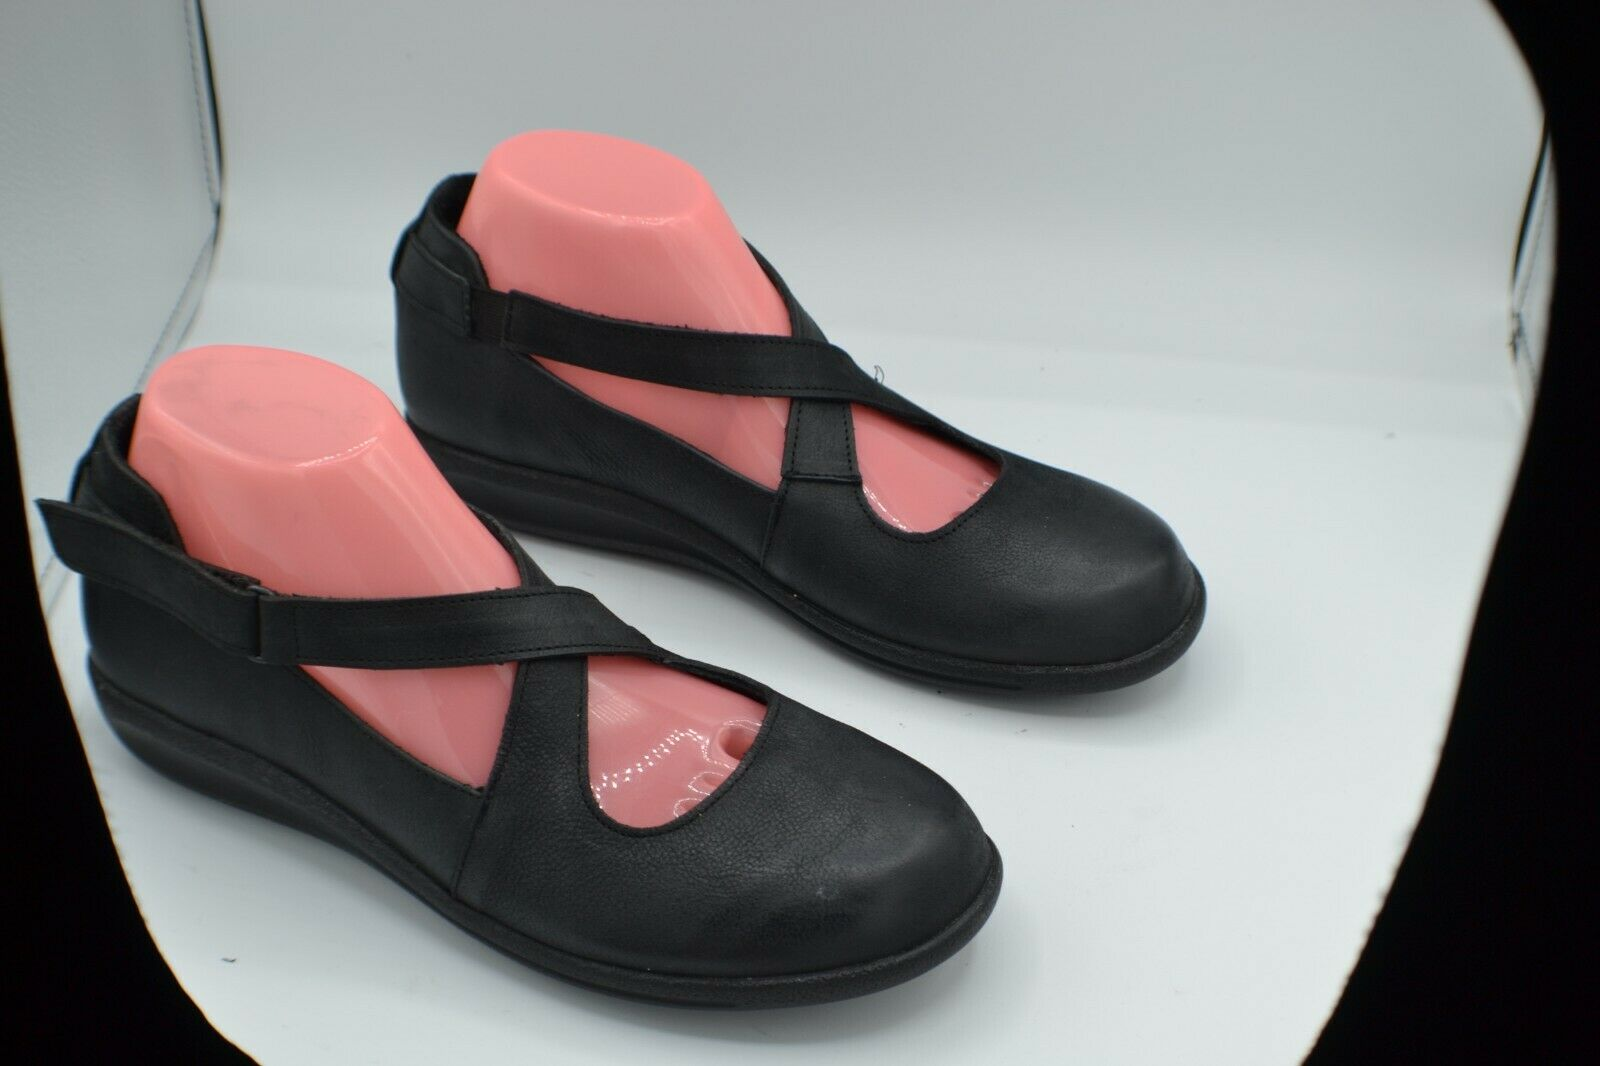 Sanita Sz 39/US 8.5--9 Black Nubuck Criss Cross Mary Jane Slip On Walking Shoes